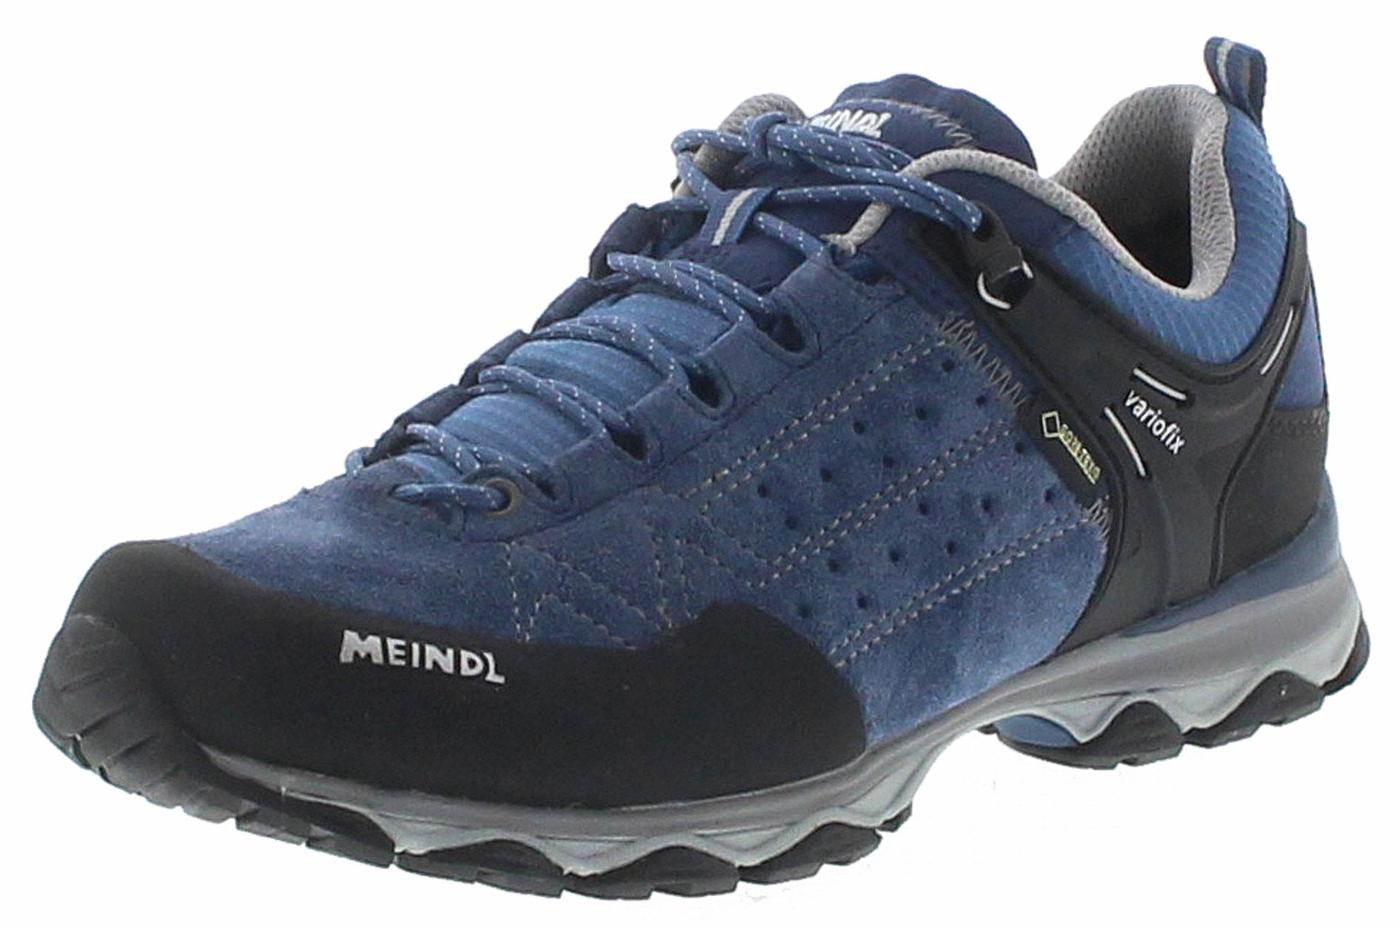 Meindl ONTARIO LADY GTX Jeans Grey Ladies Hiking Shoes Blue